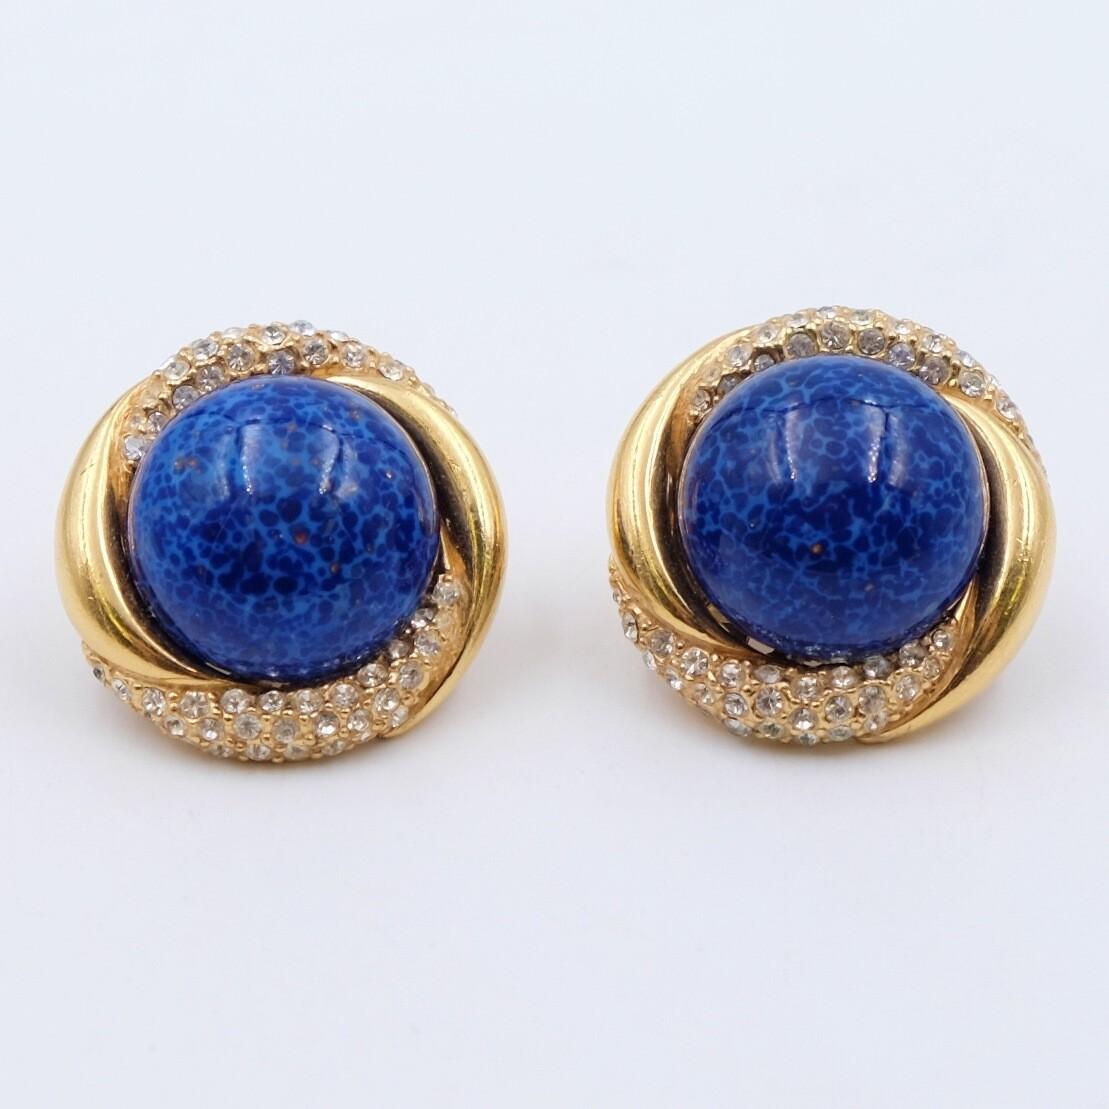 Vintage Ciner Earrings Faux Lapis Lazuli